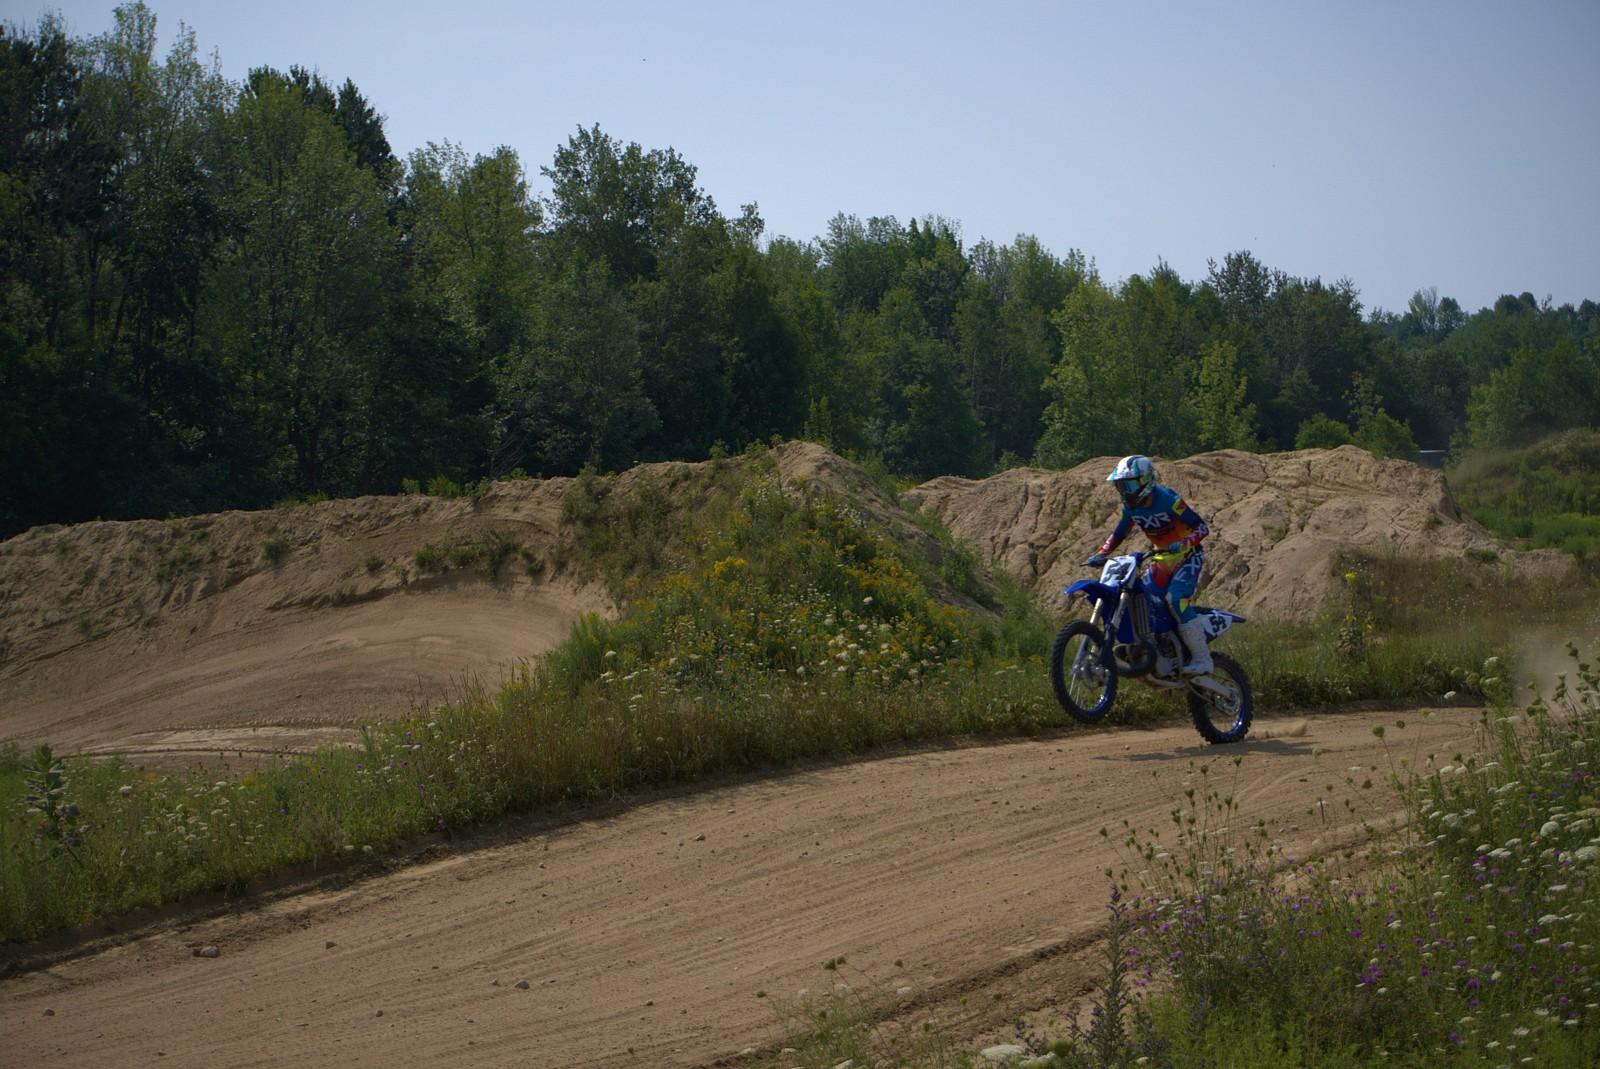 Photo 5 - DawsonBMX54 - Motocross Pictures - Vital MX